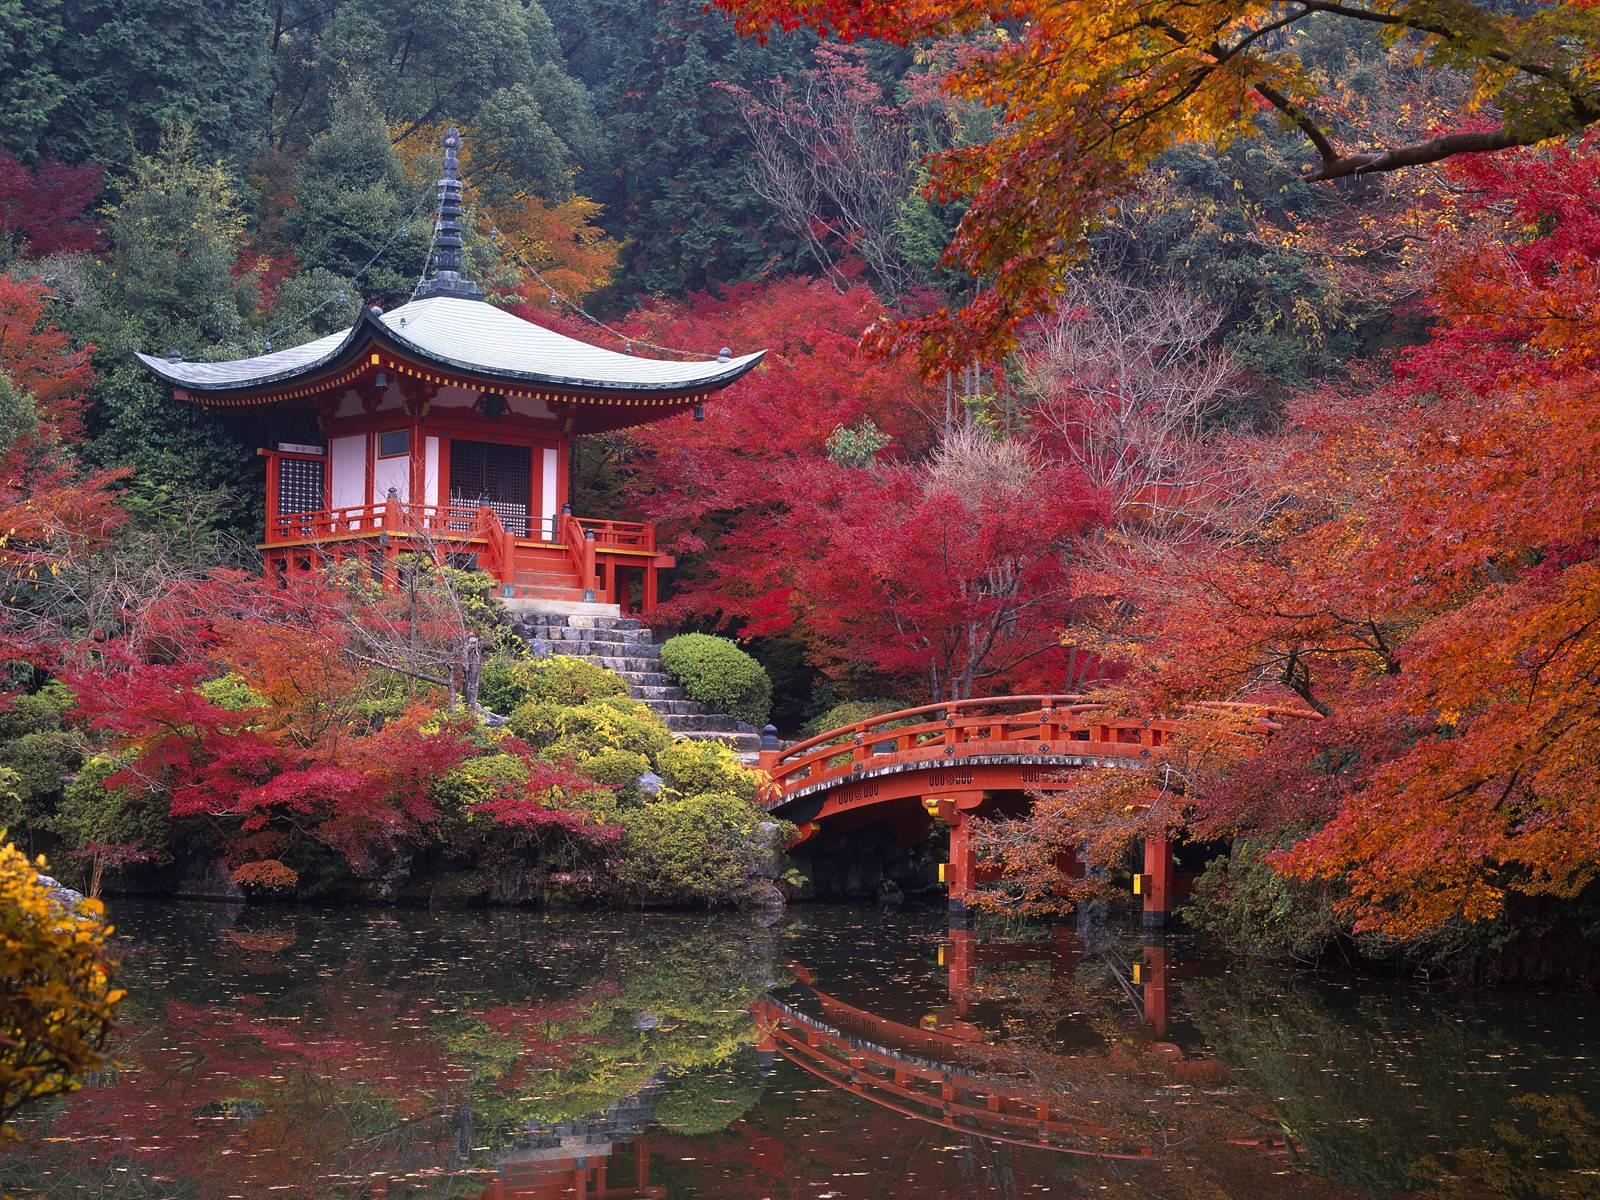 daigo-ji_buddhista_templom_japan.jpg